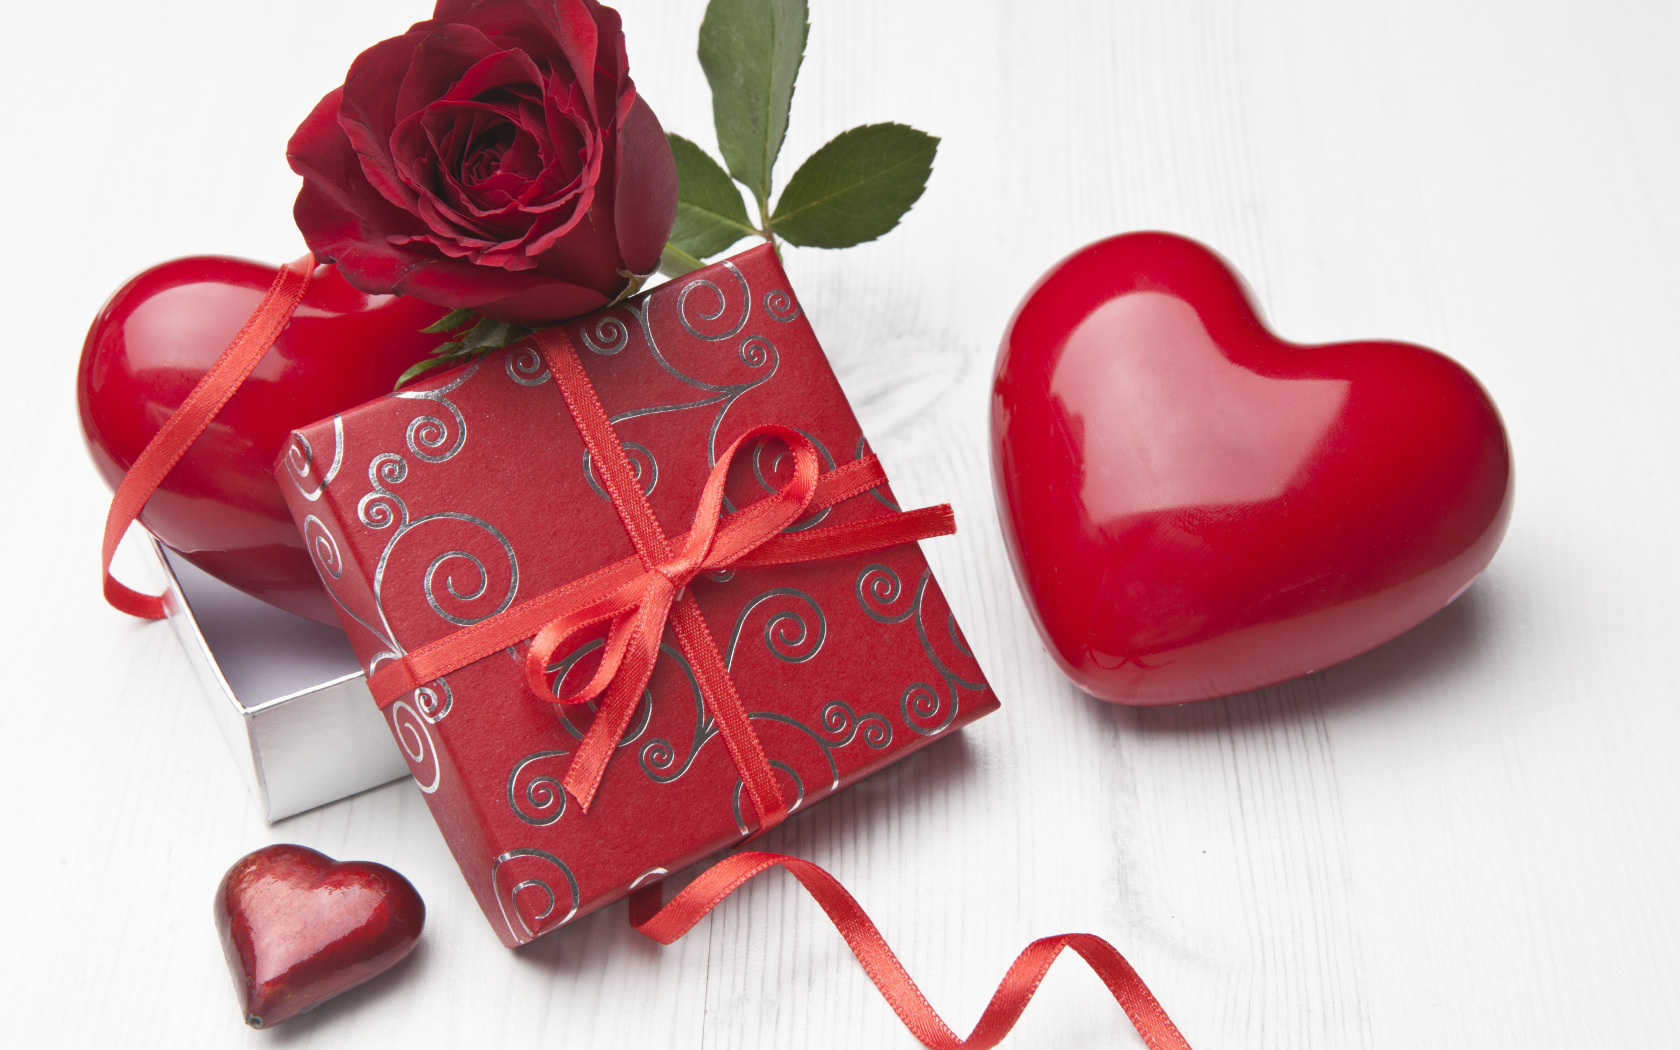 Фото в сердце на подарок